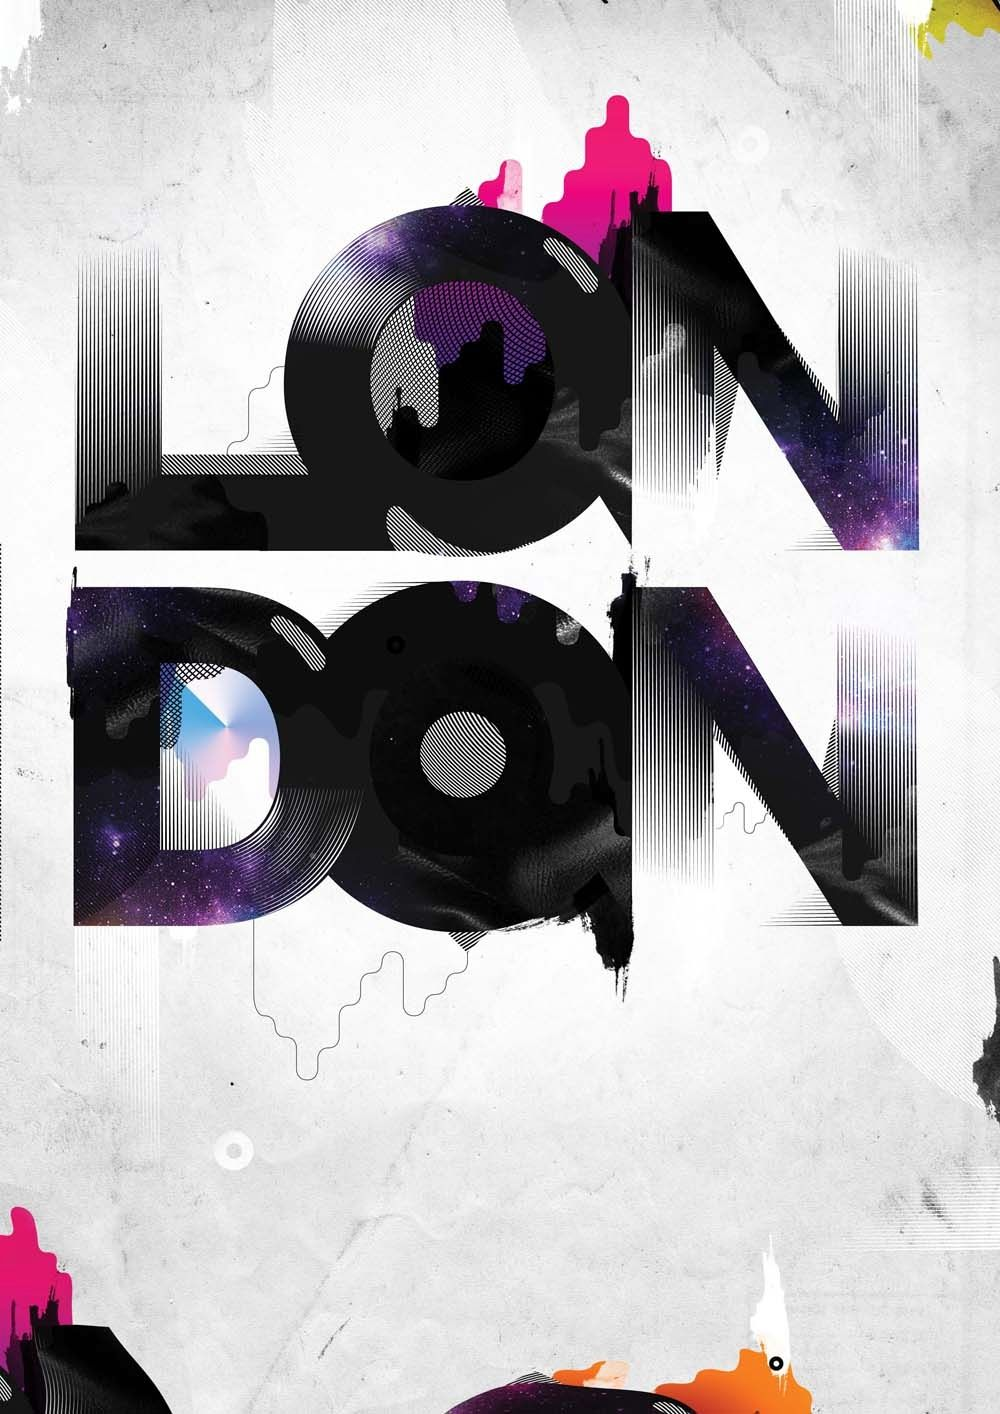 Create urban type adobe illustrator tutorial via digital arts create urban type adobe illustrator tutorial via digital arts online baditri Image collections